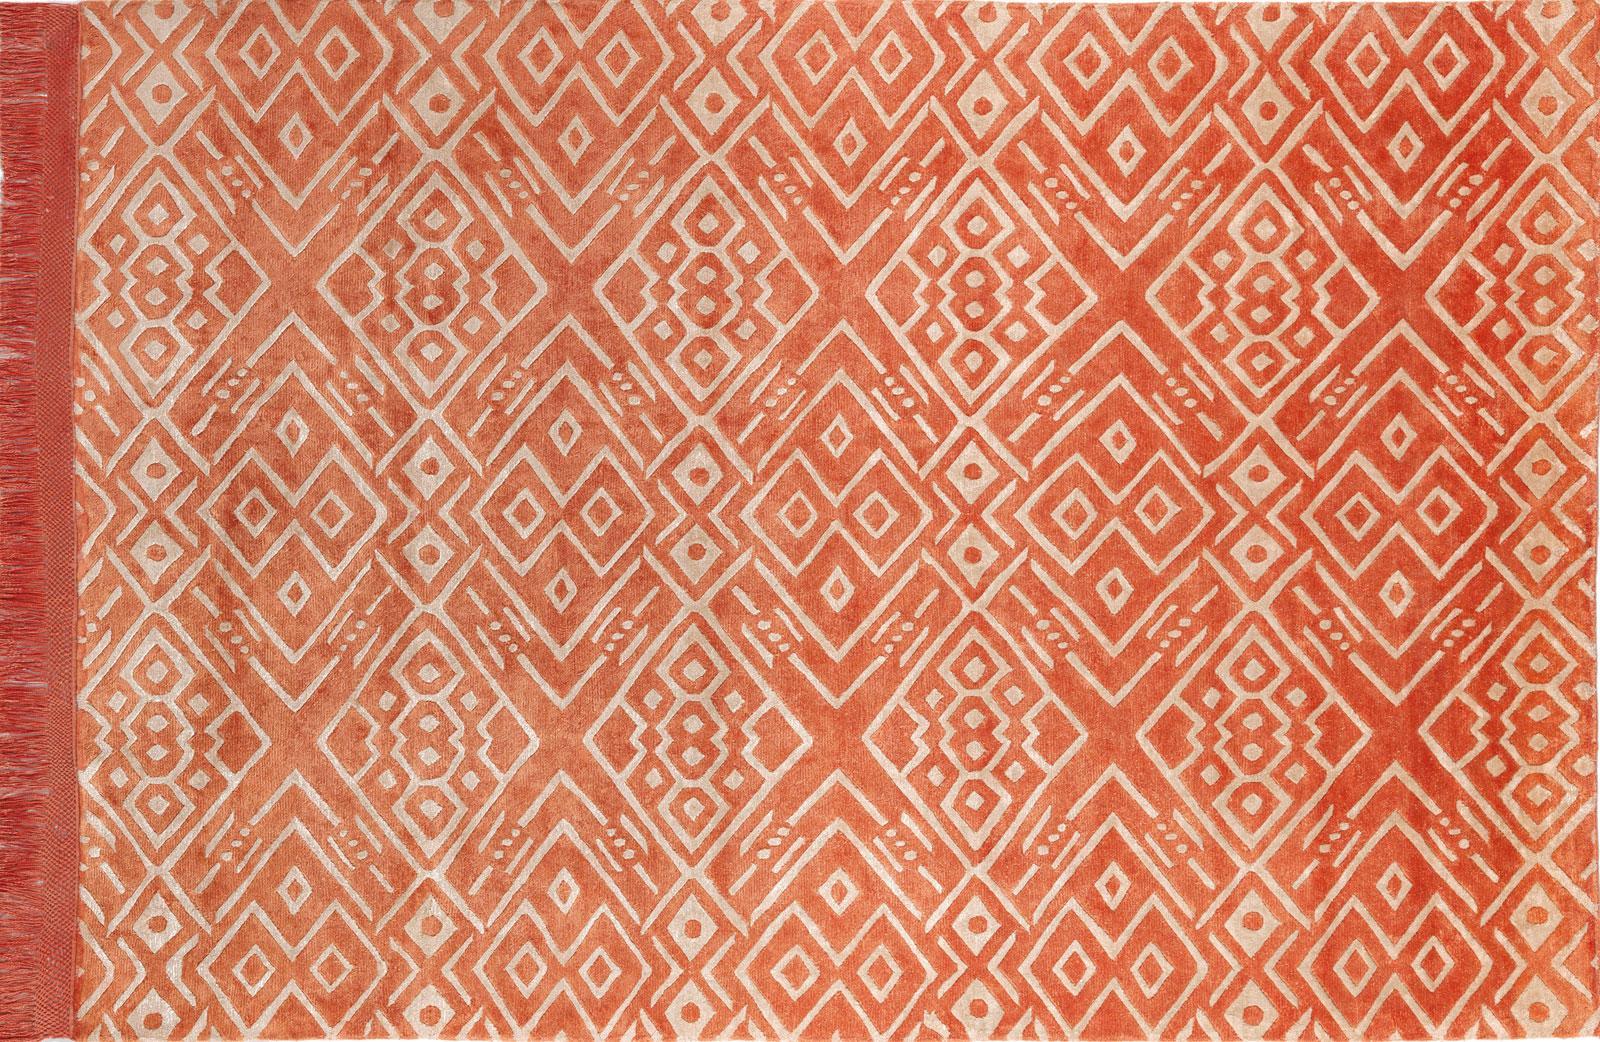 Isabel tapis contemporain idd - Tapis bambou grande taille ...